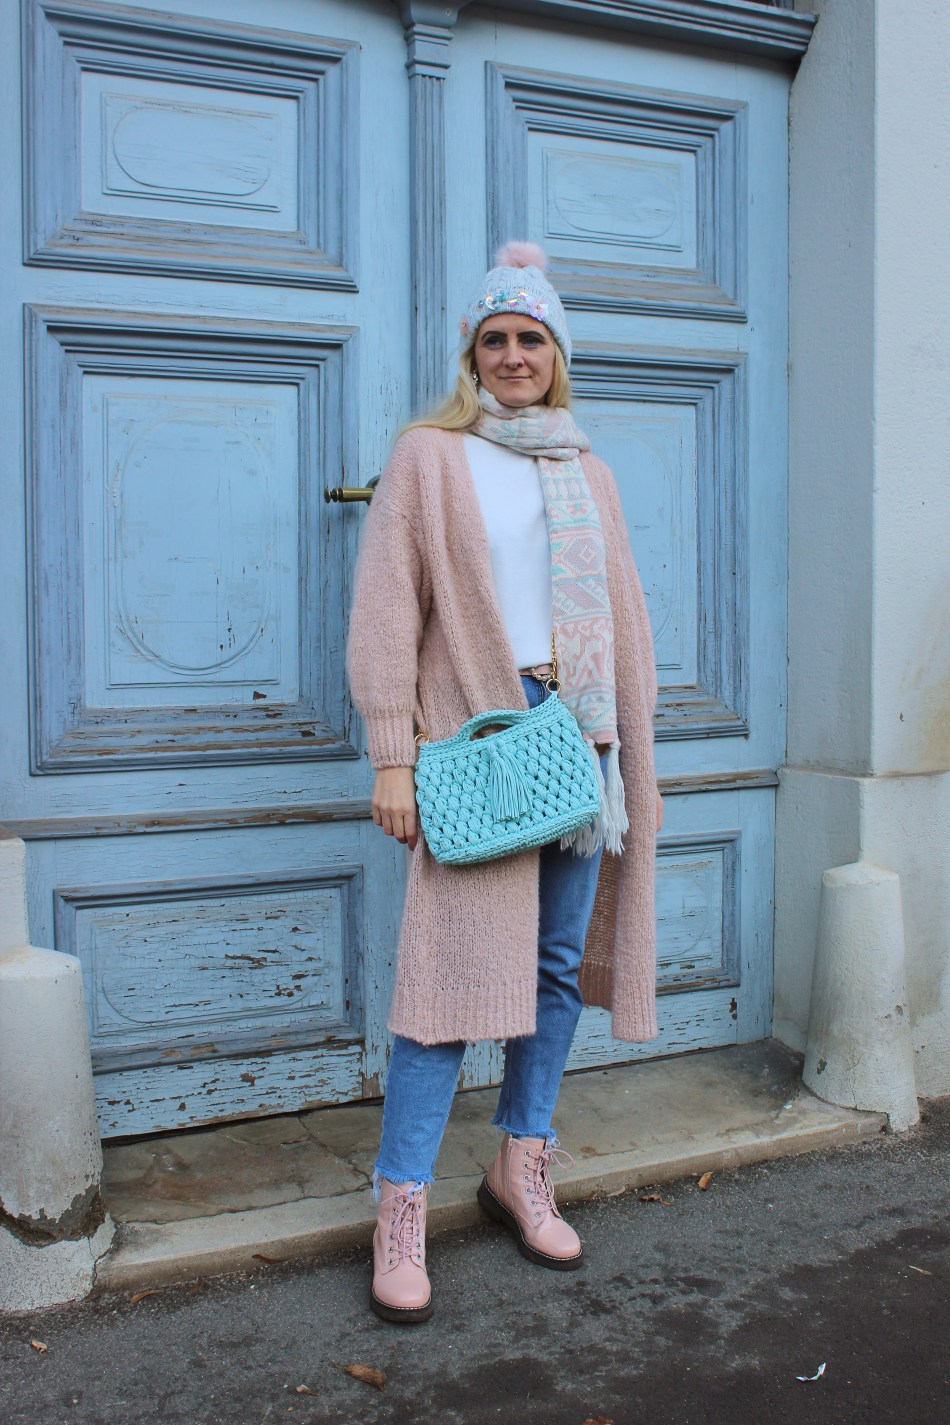 Cafe-Solo-Design-Fashion-Knitbag-pink-Boots-Cardigan-Pastellfarben-Pastelllook-carrieslifestyle-tamara-prutsch